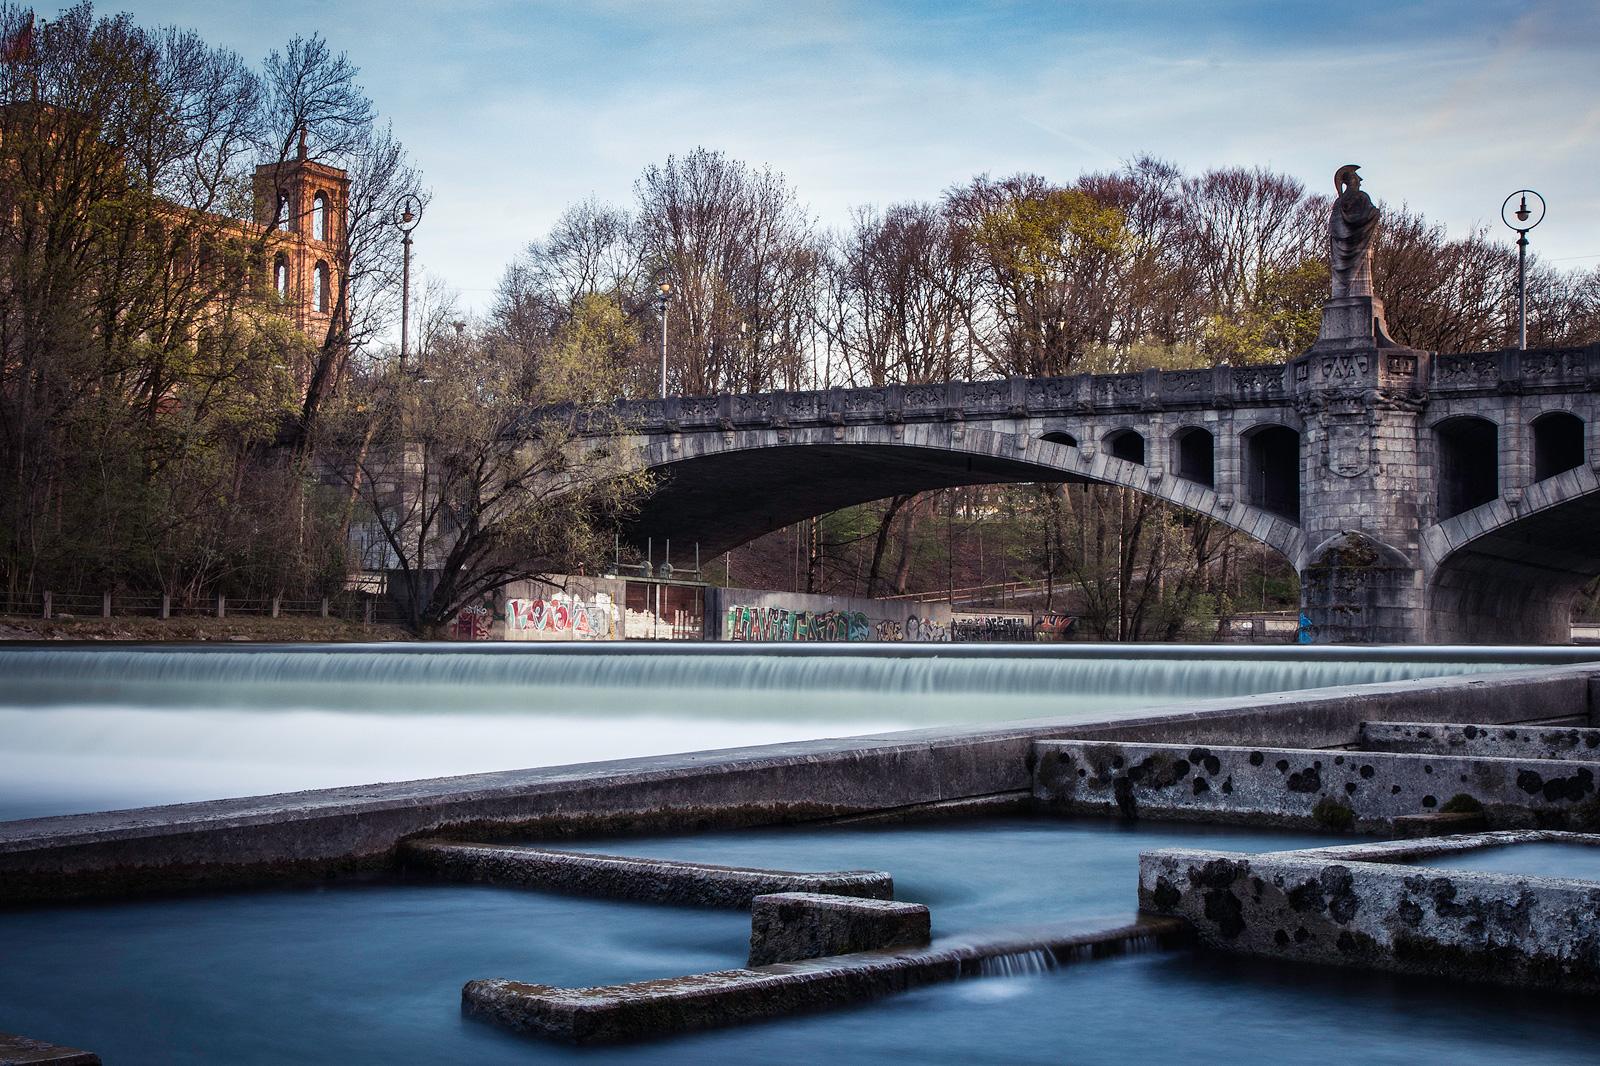 Fotospot Maximiliansbrücke München, Schwindinsel, kathrinsworld, Kathrin's World